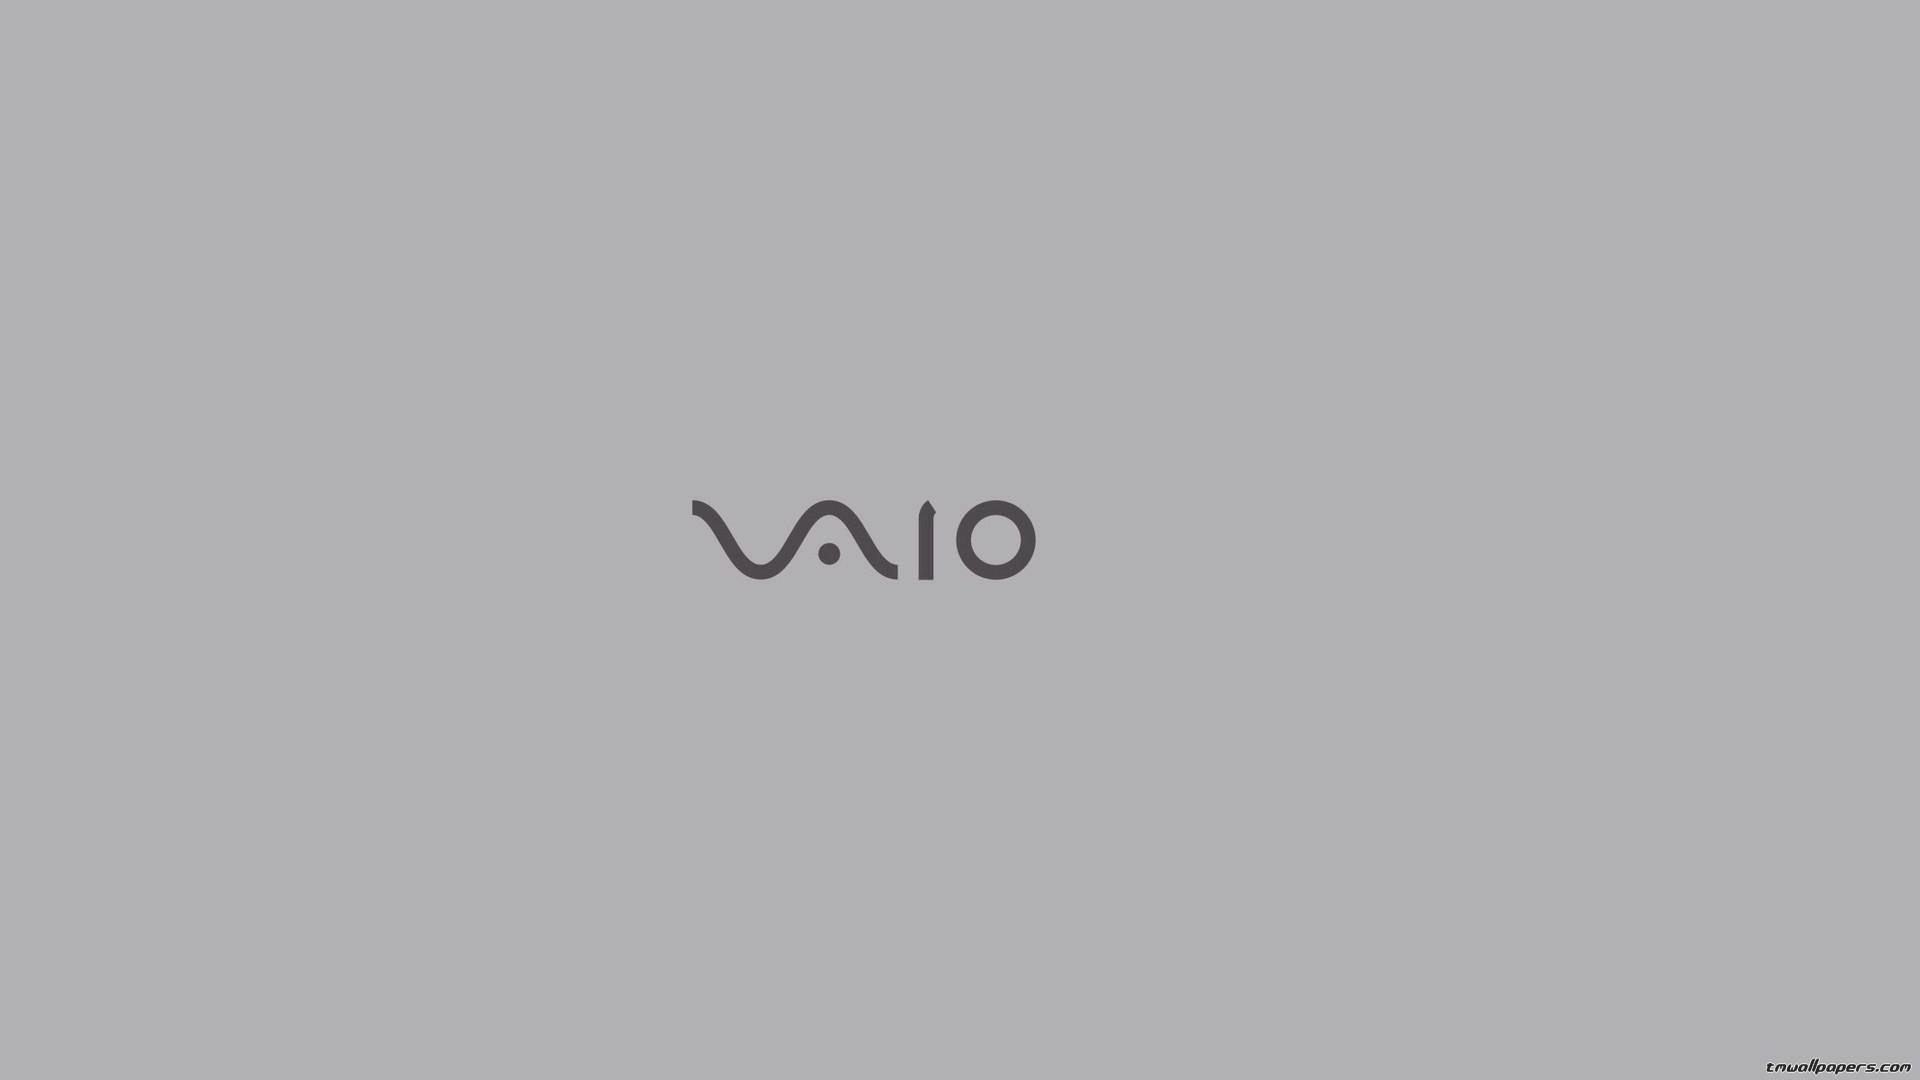 Sony vaio wallpaper 58 pictures - Sony vaio wallpaper 1280x800 ...